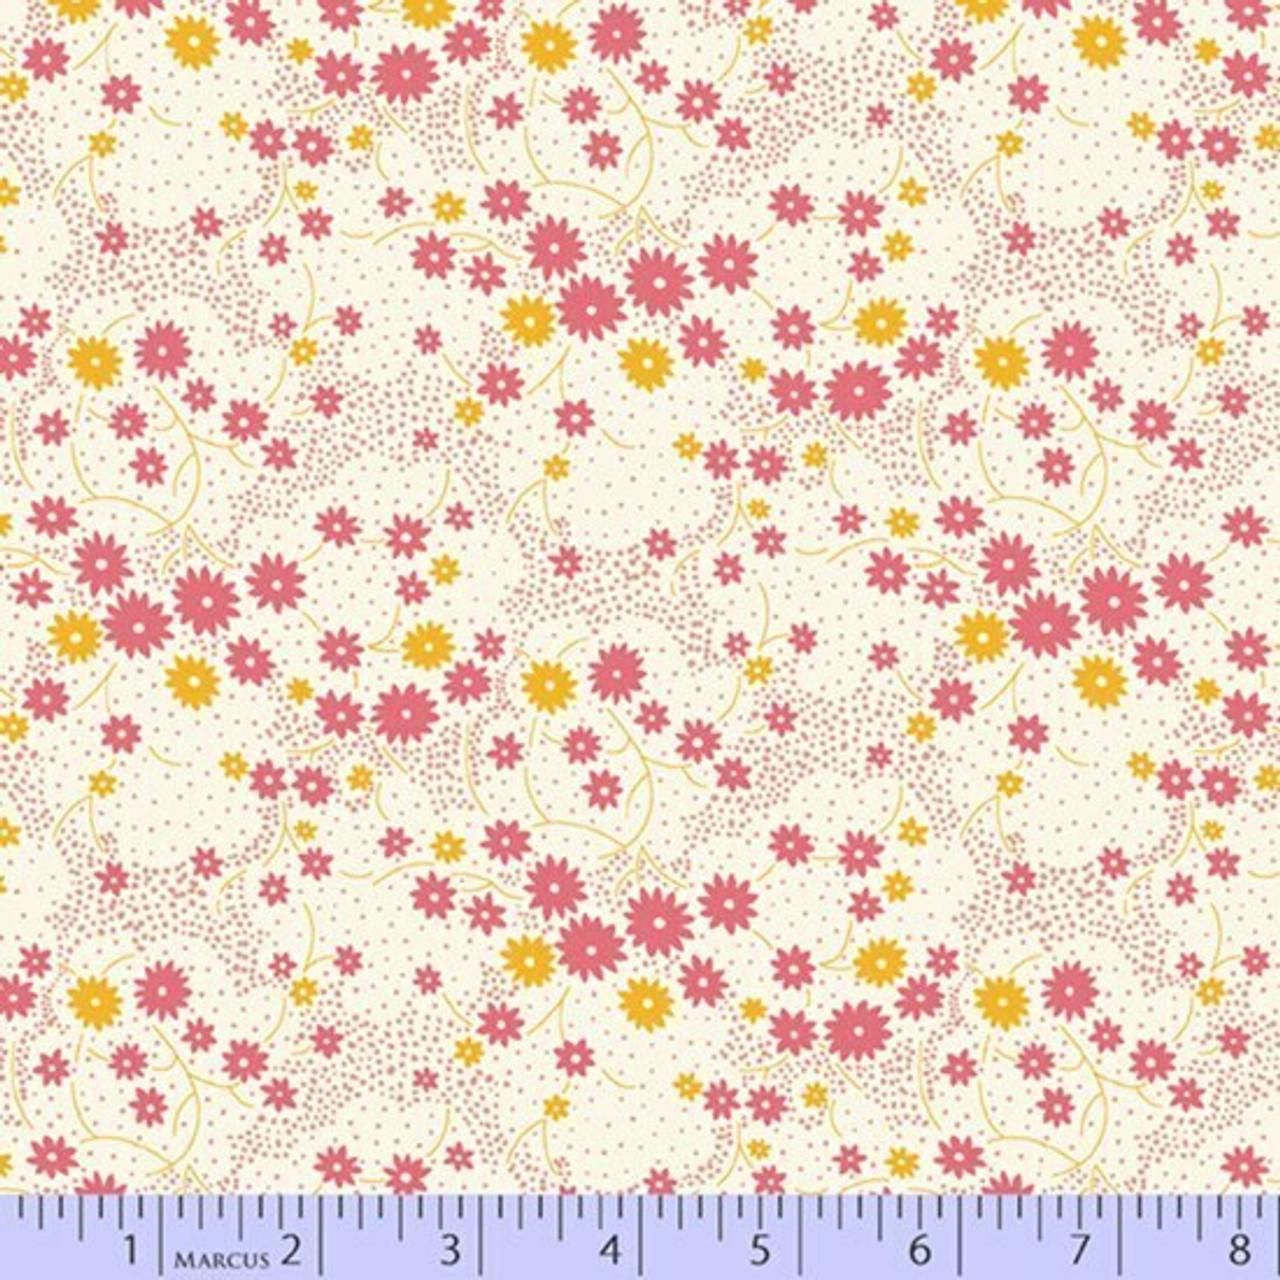 Aunt Grace's Apron - Pink Sprinkle Blooms